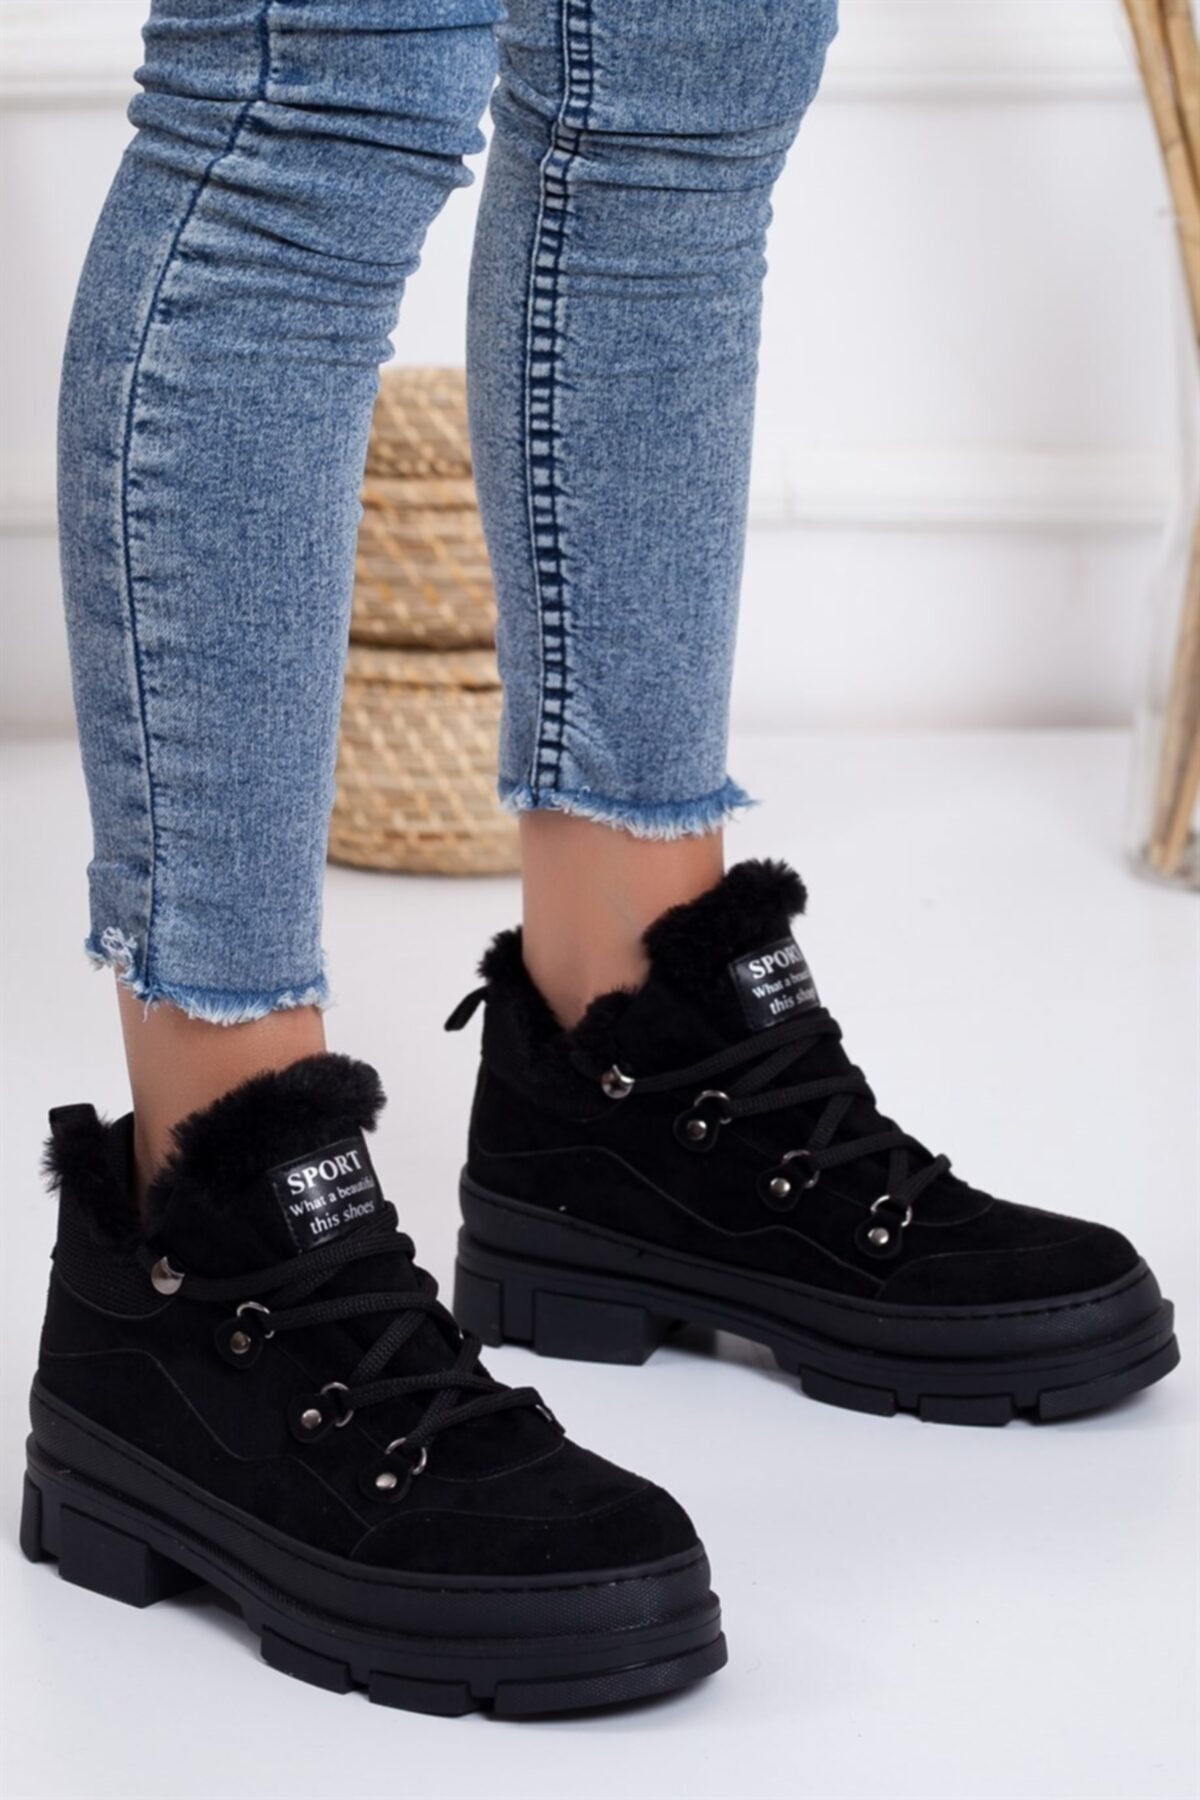 Lovita Shoes Kadın Siyah Süet Elisha Spor Bot